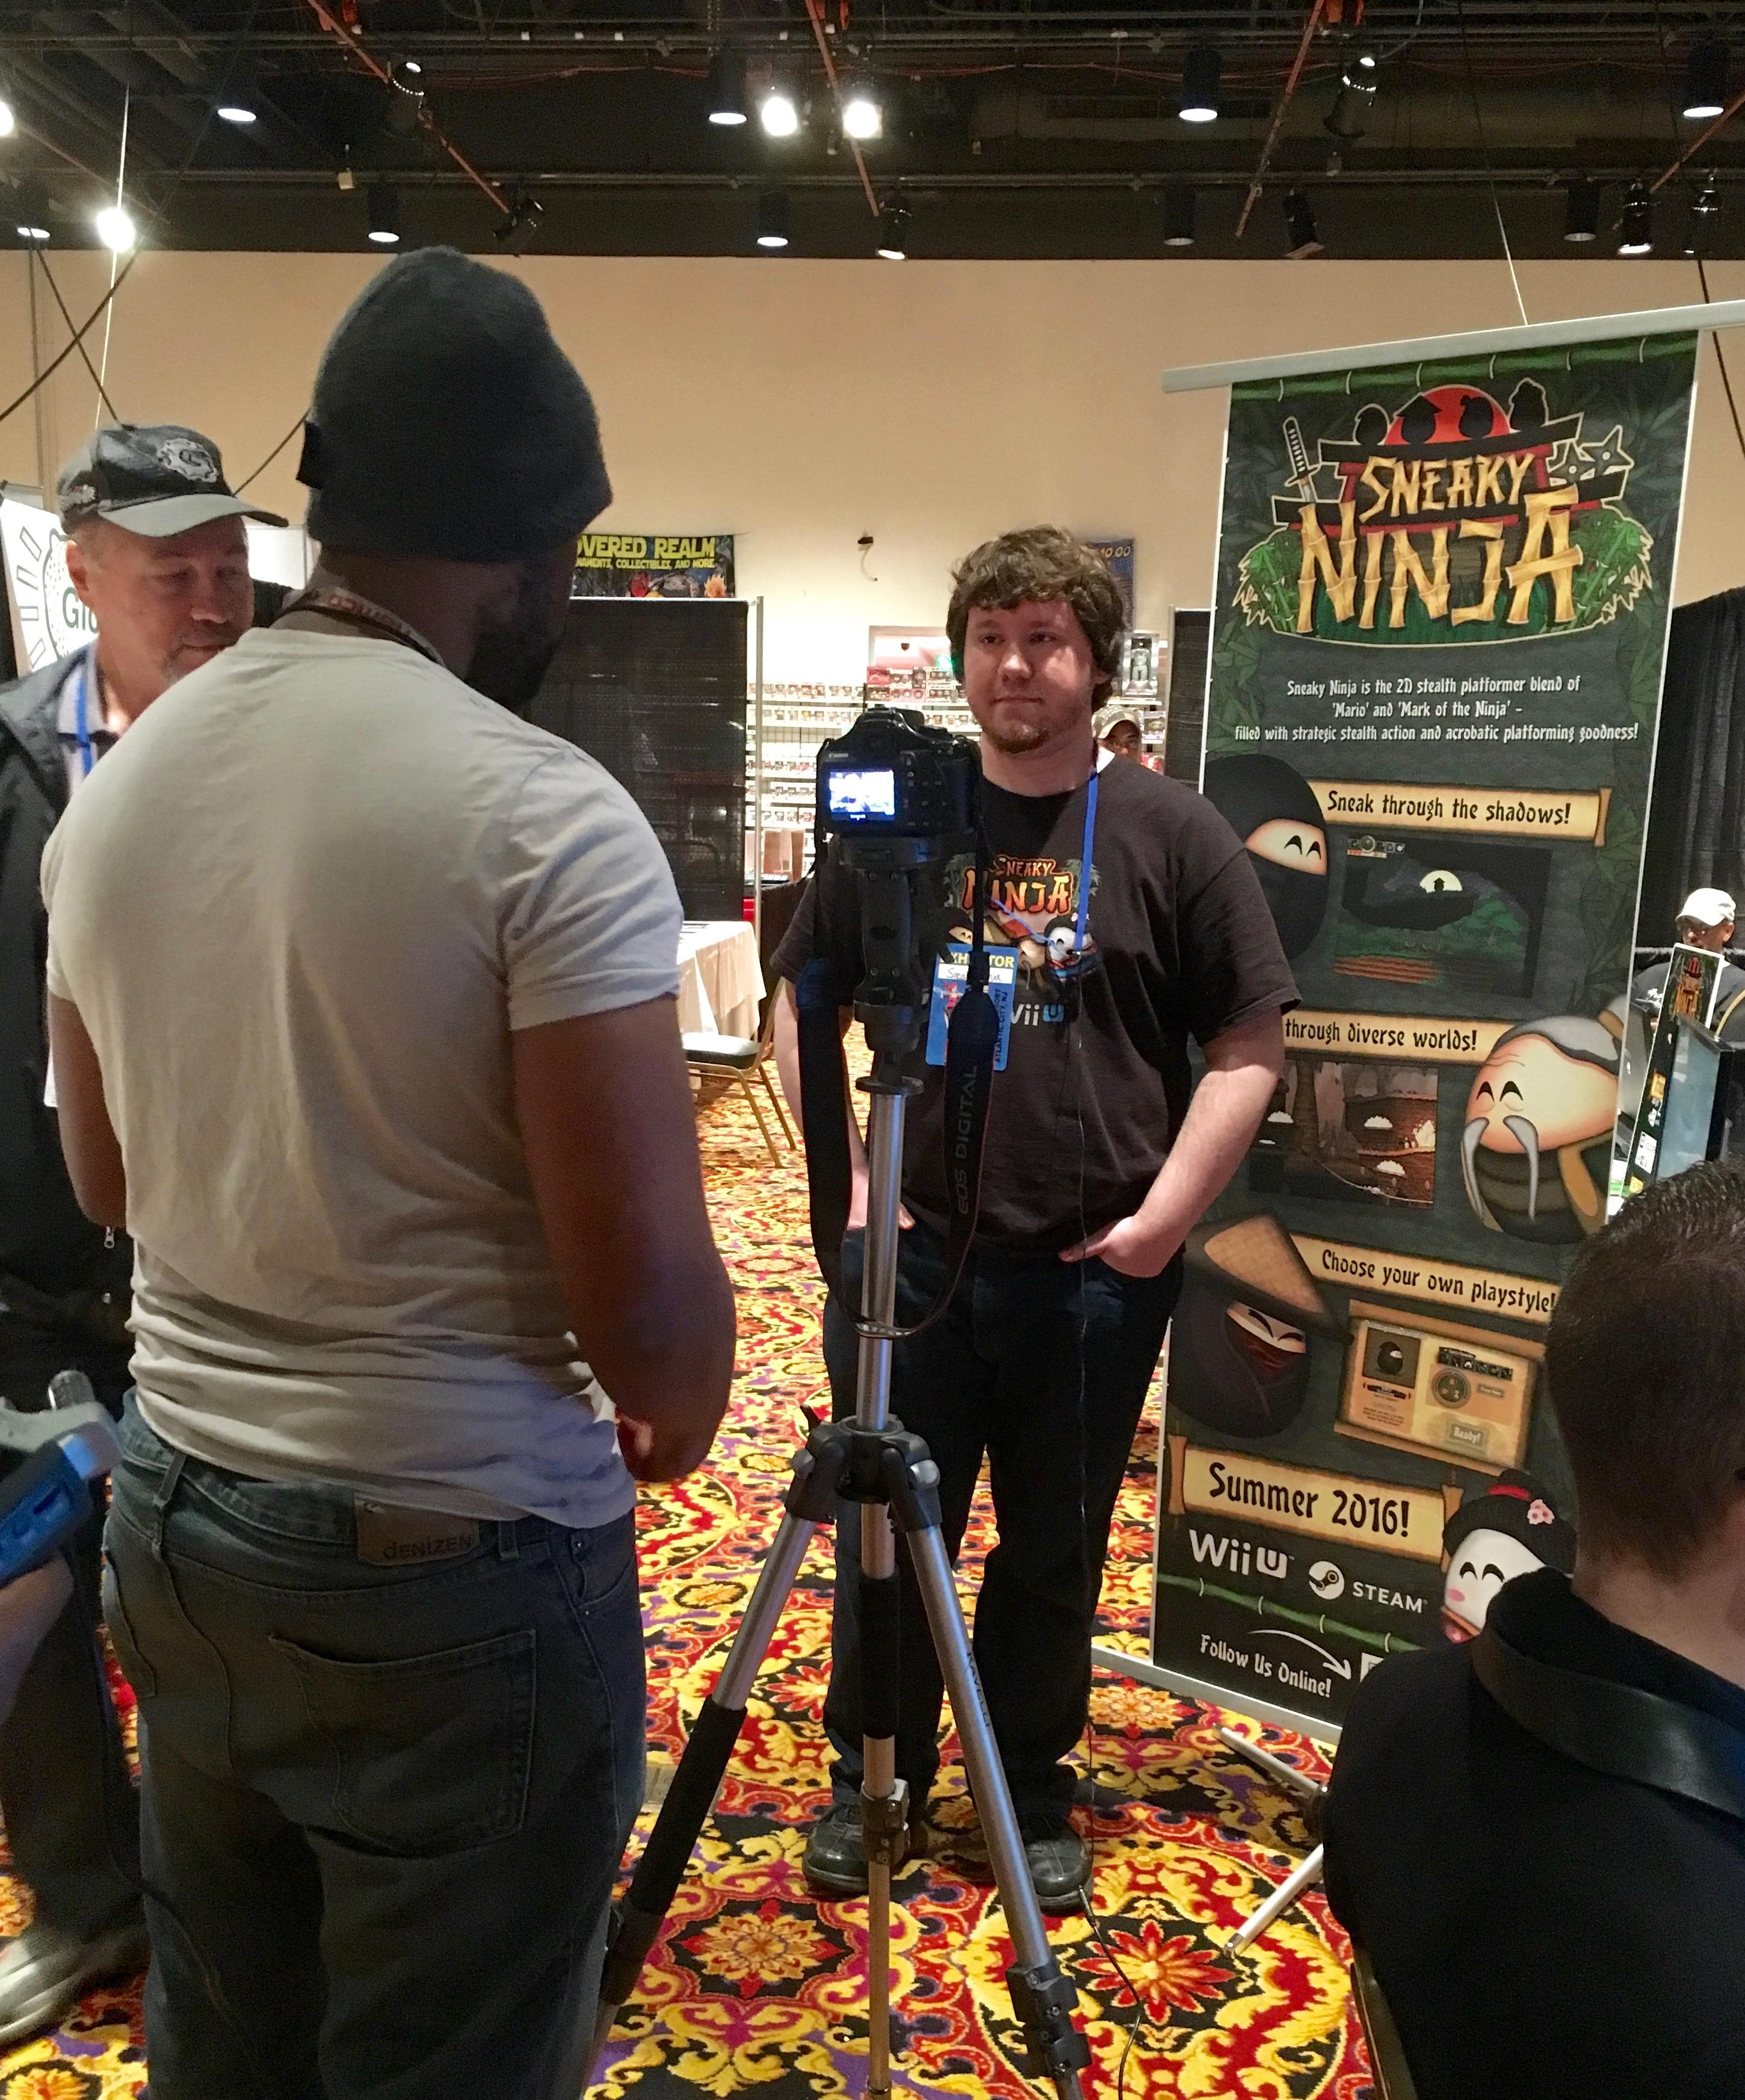 press sneaky ninja